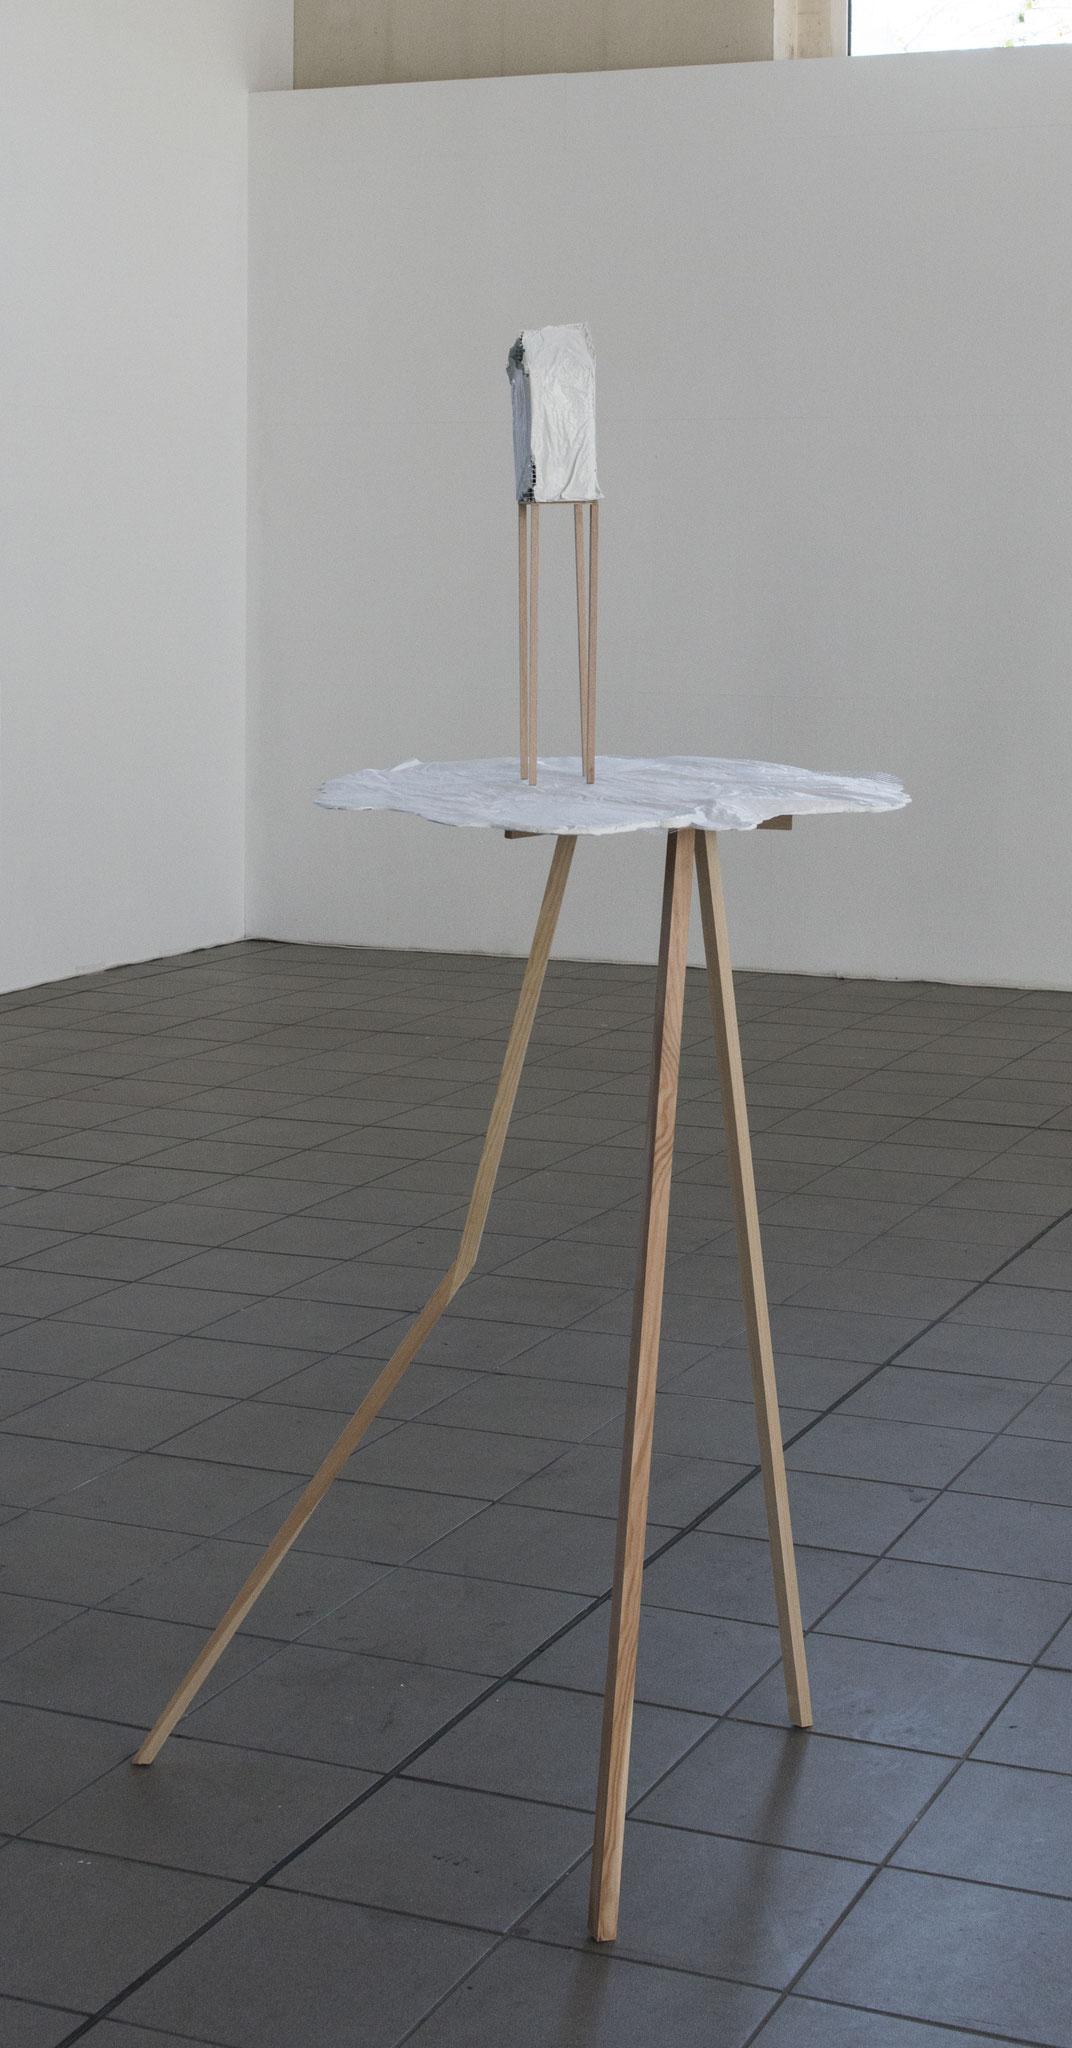 Wolkenkuckucksheim_2018_Holz, Zement, Gewebe_ca 200 x 120 x 60 cm_Foto: Gabi Rottes